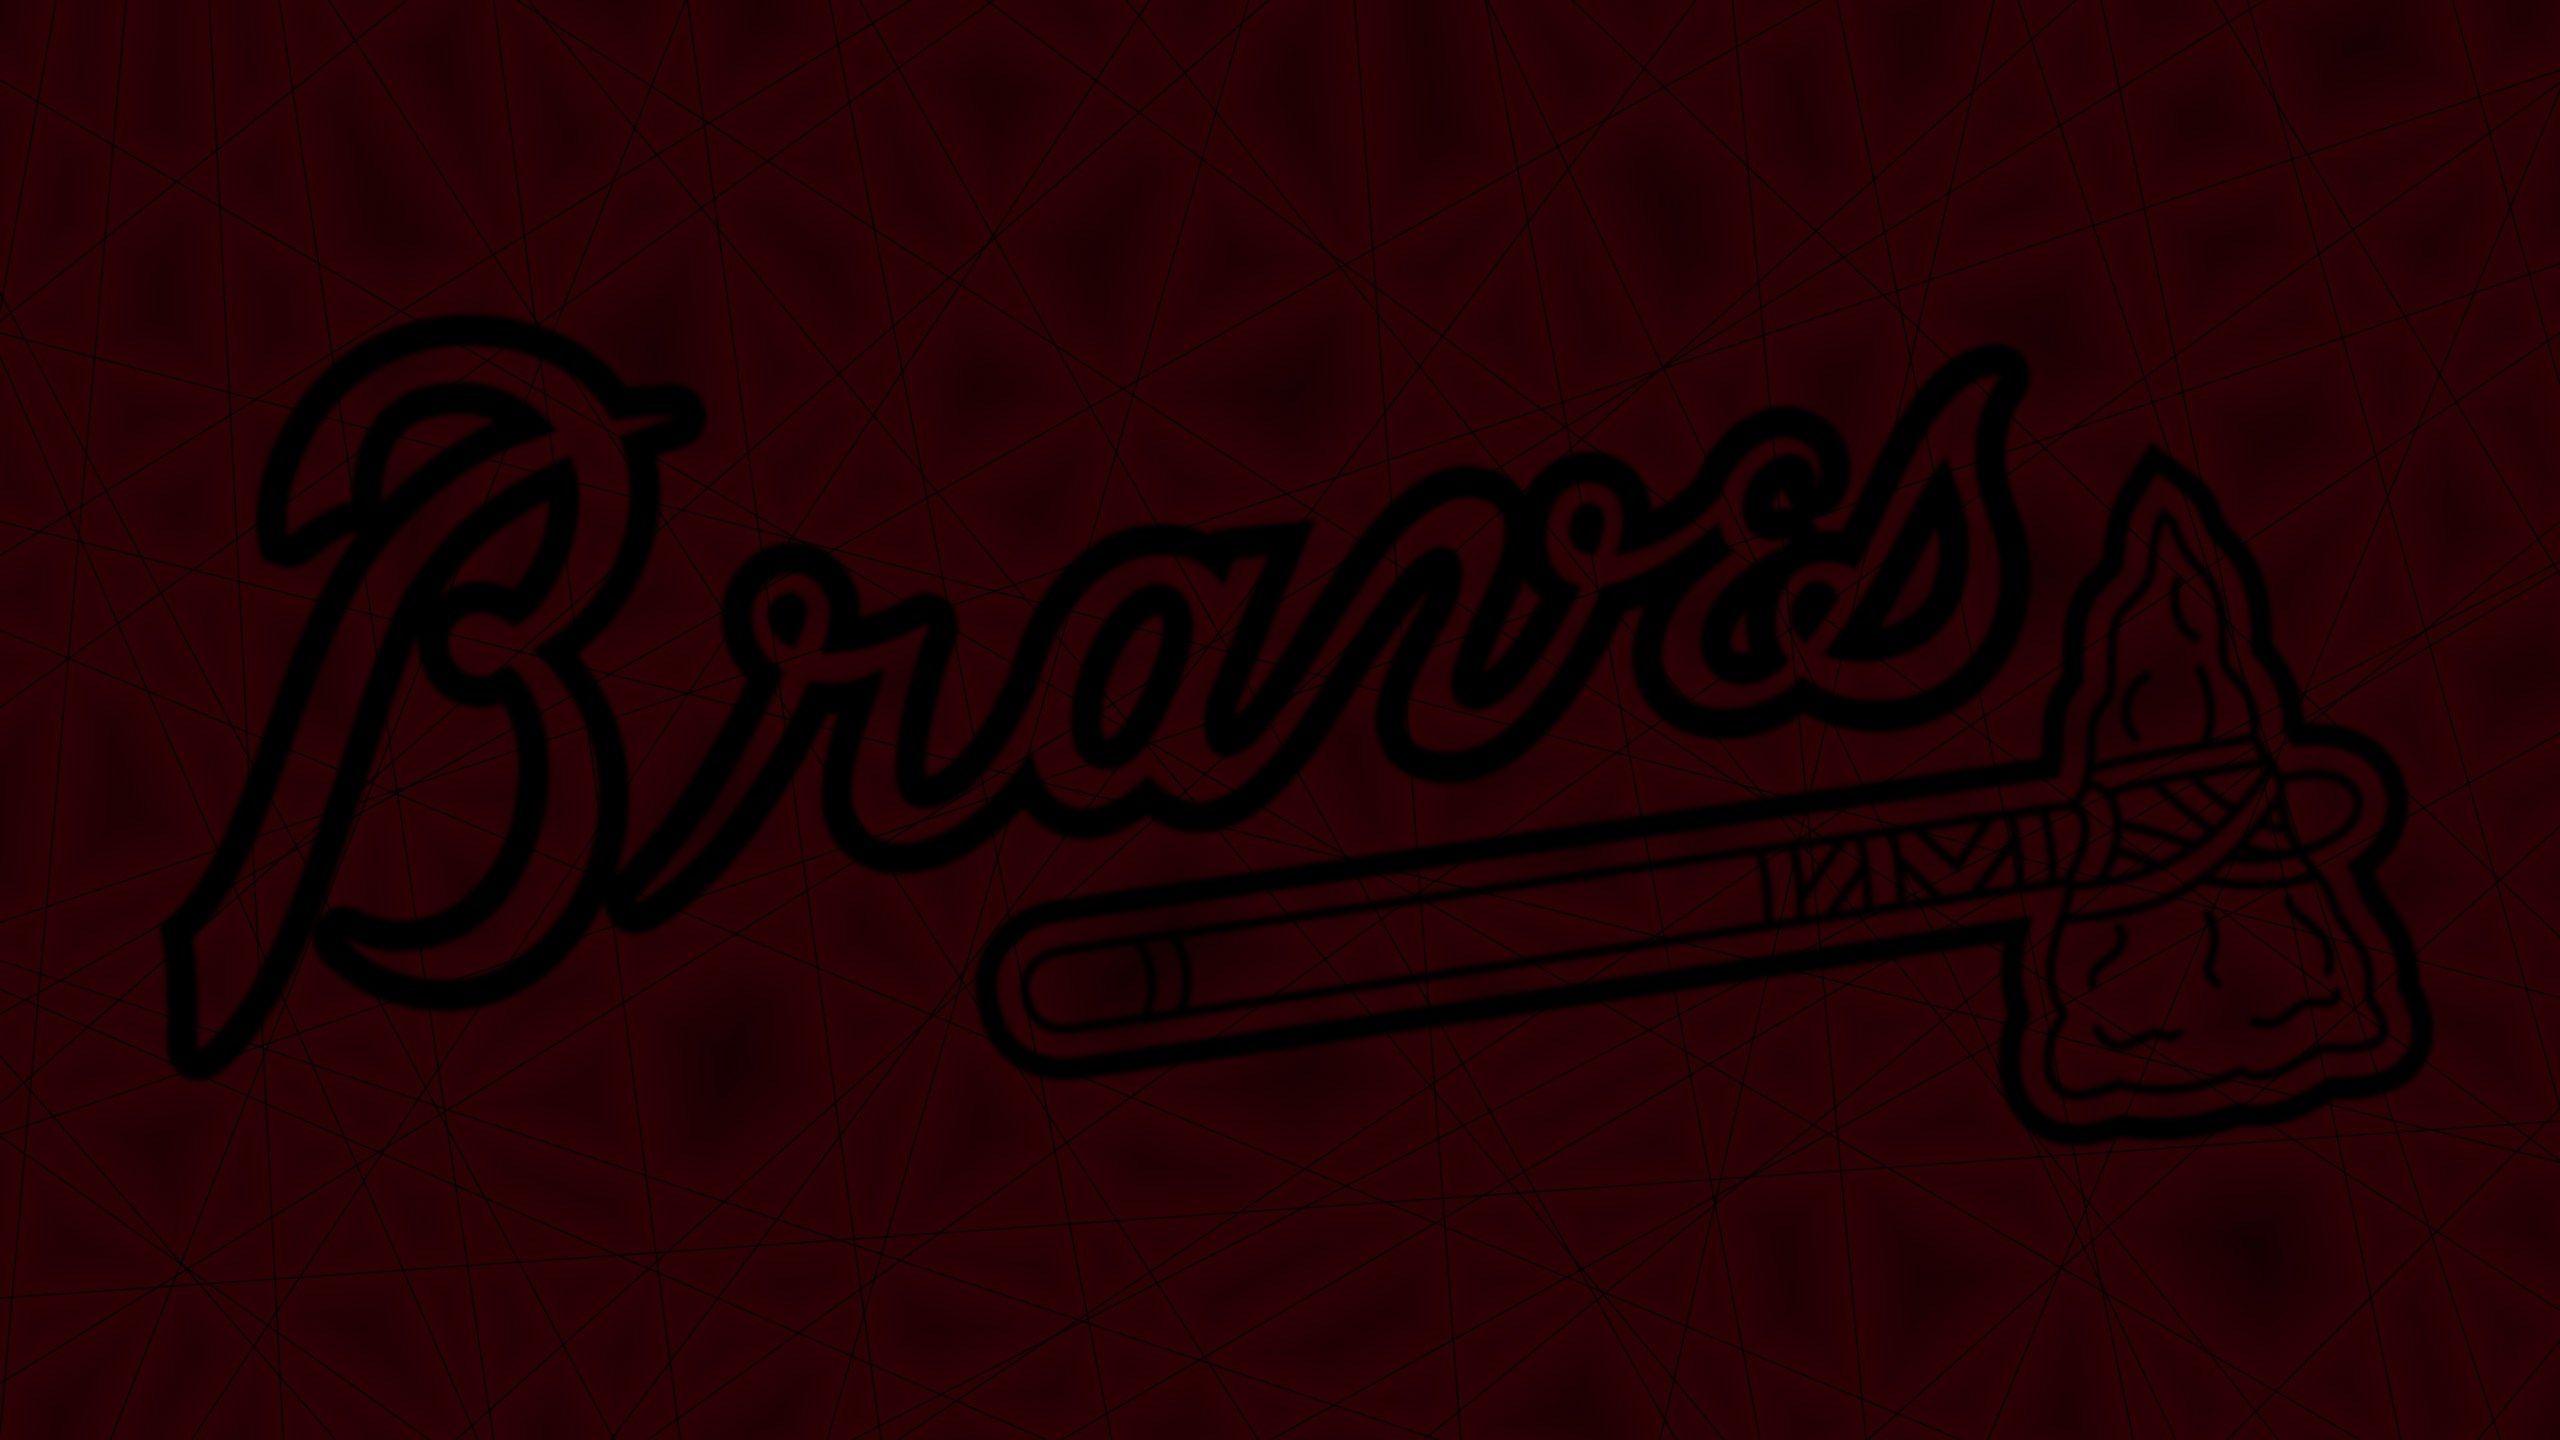 Atlanta Braves Wallpapers Hd Atlanta Braves Wallpaper Atlanta Braves Logo Atlanta Braves